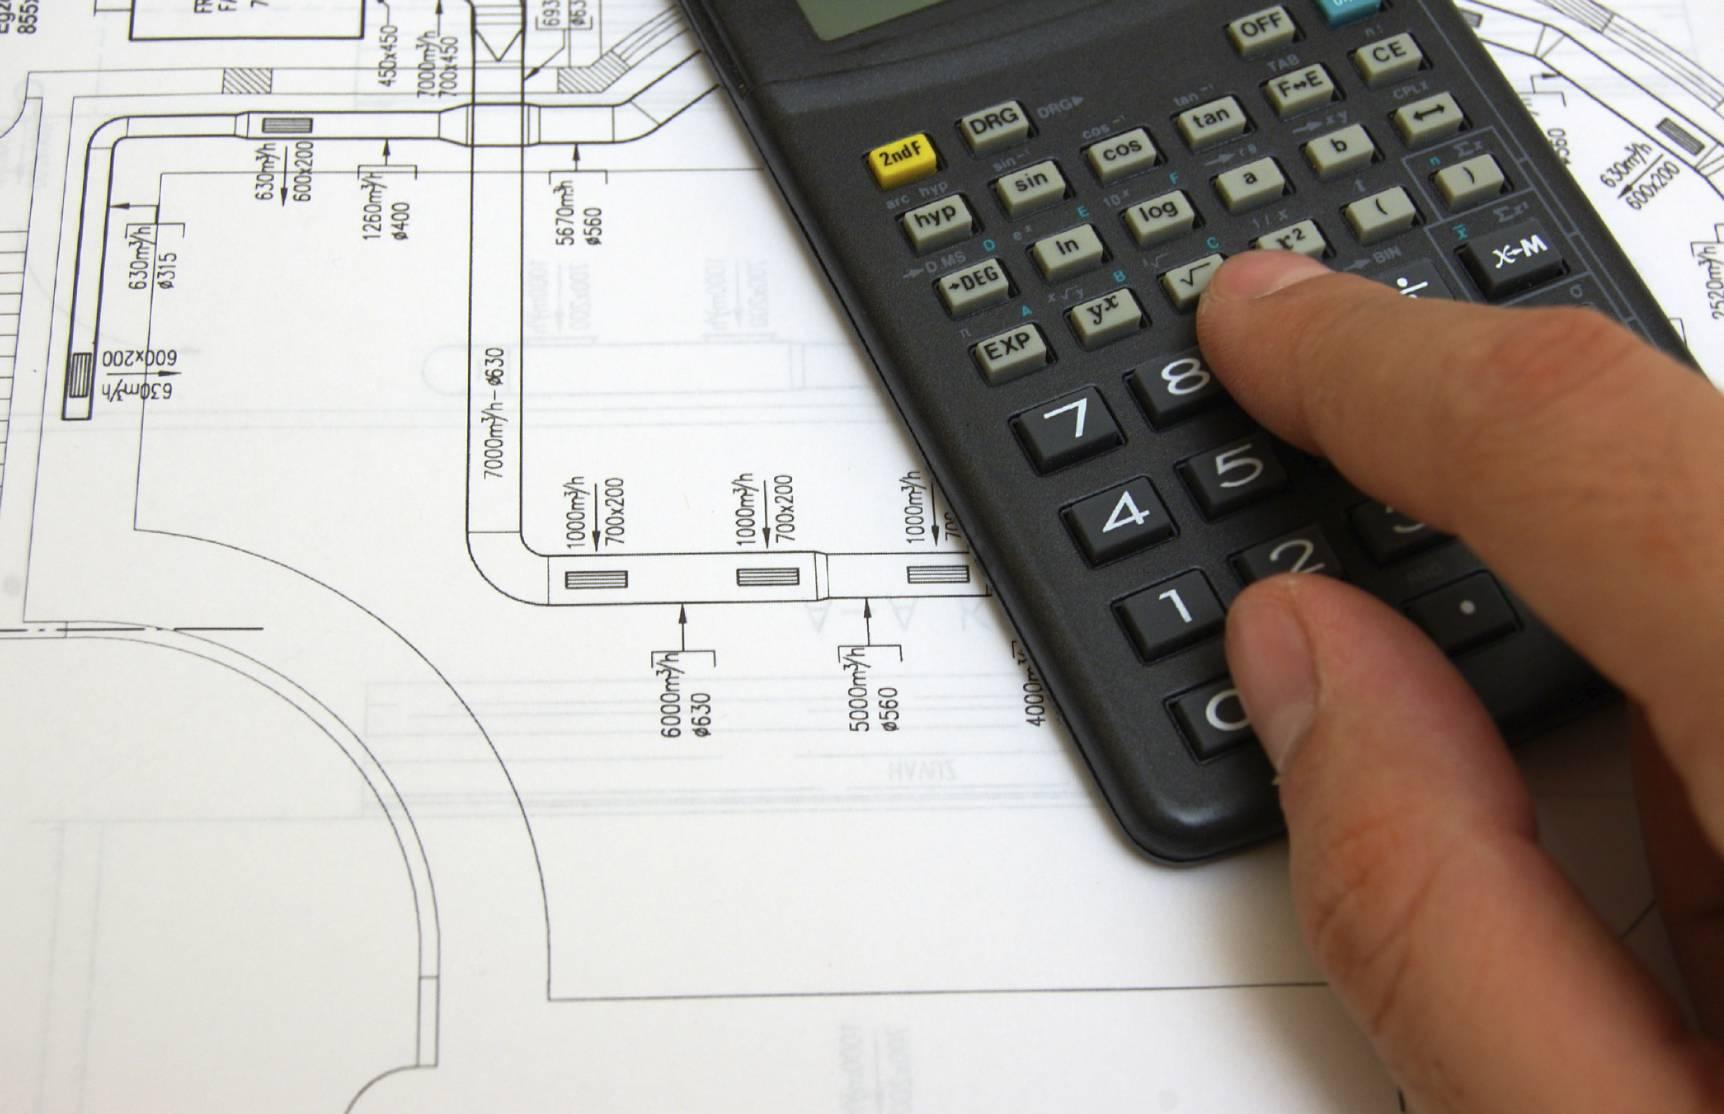 Vente immobilière : à quoi sert cela ?